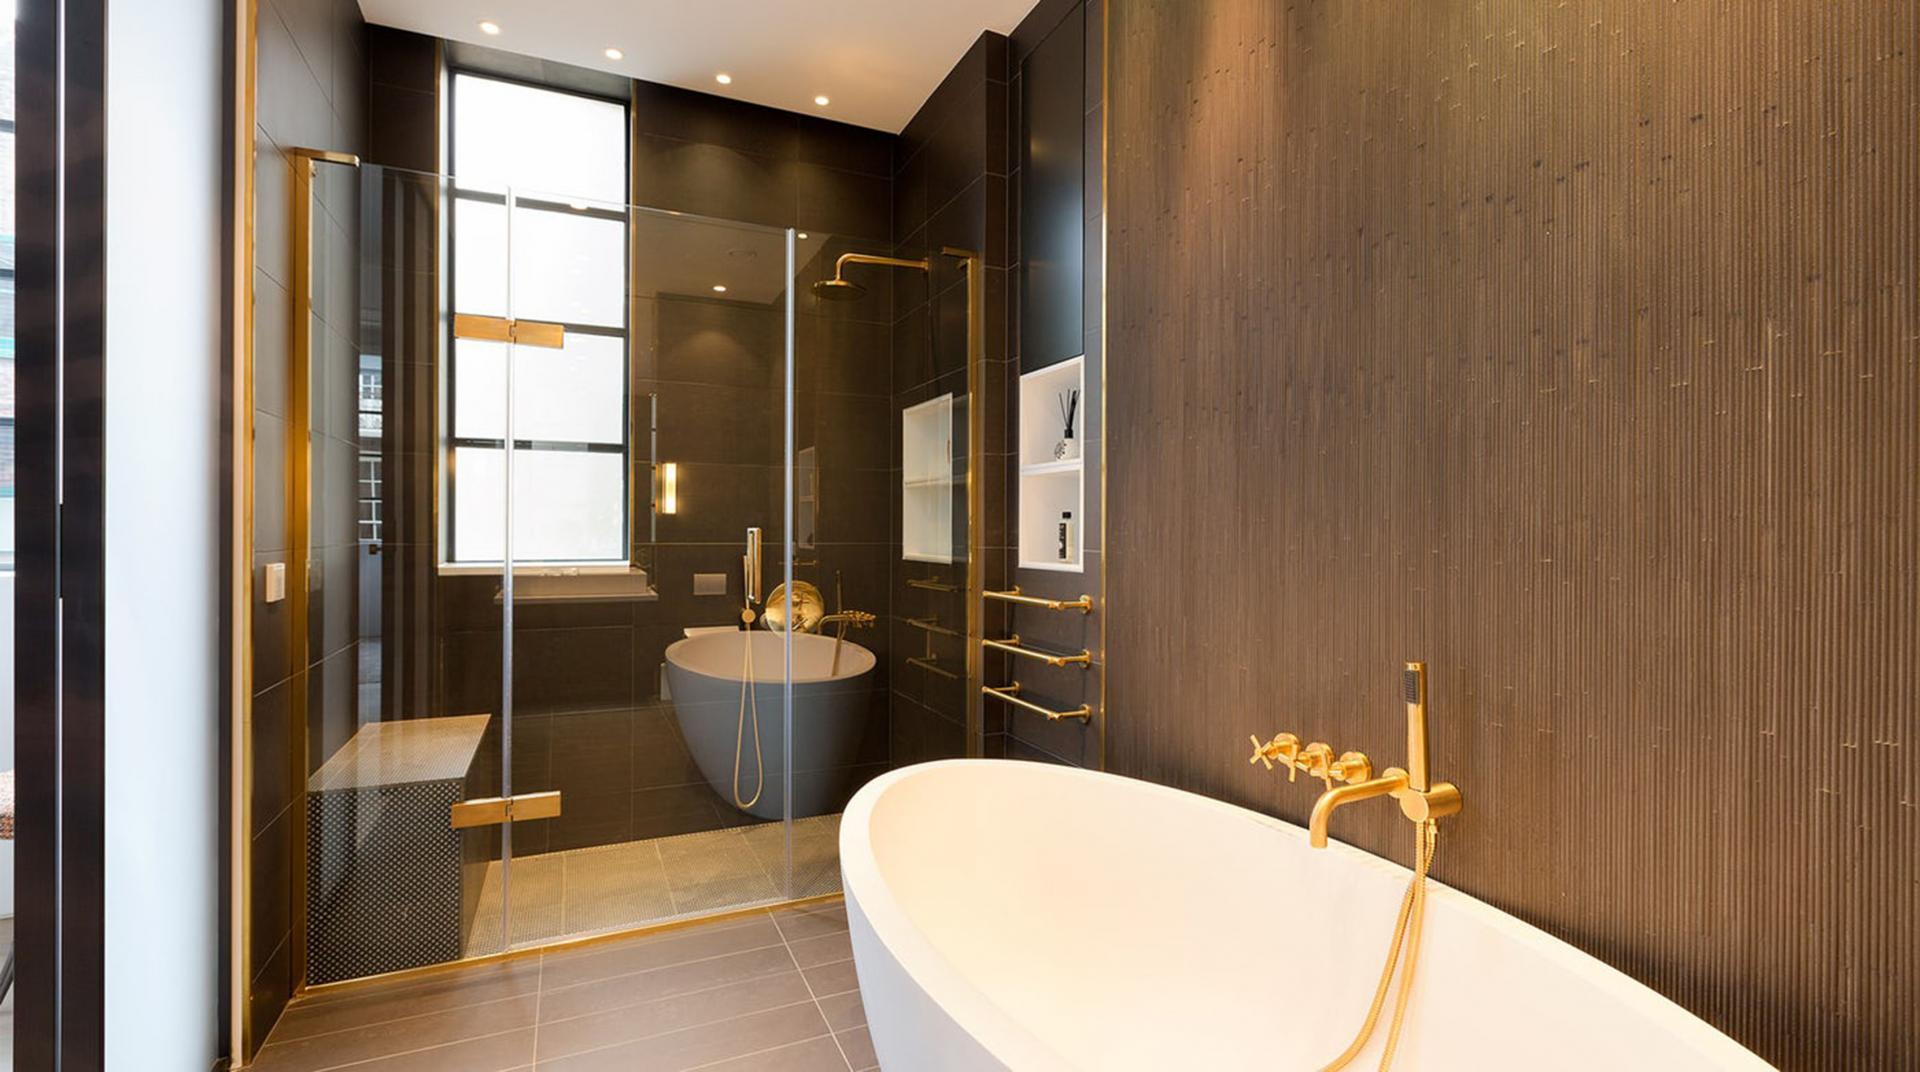 Bathtub at Royalty Mews, Carnaby, London - Citybase Apartments